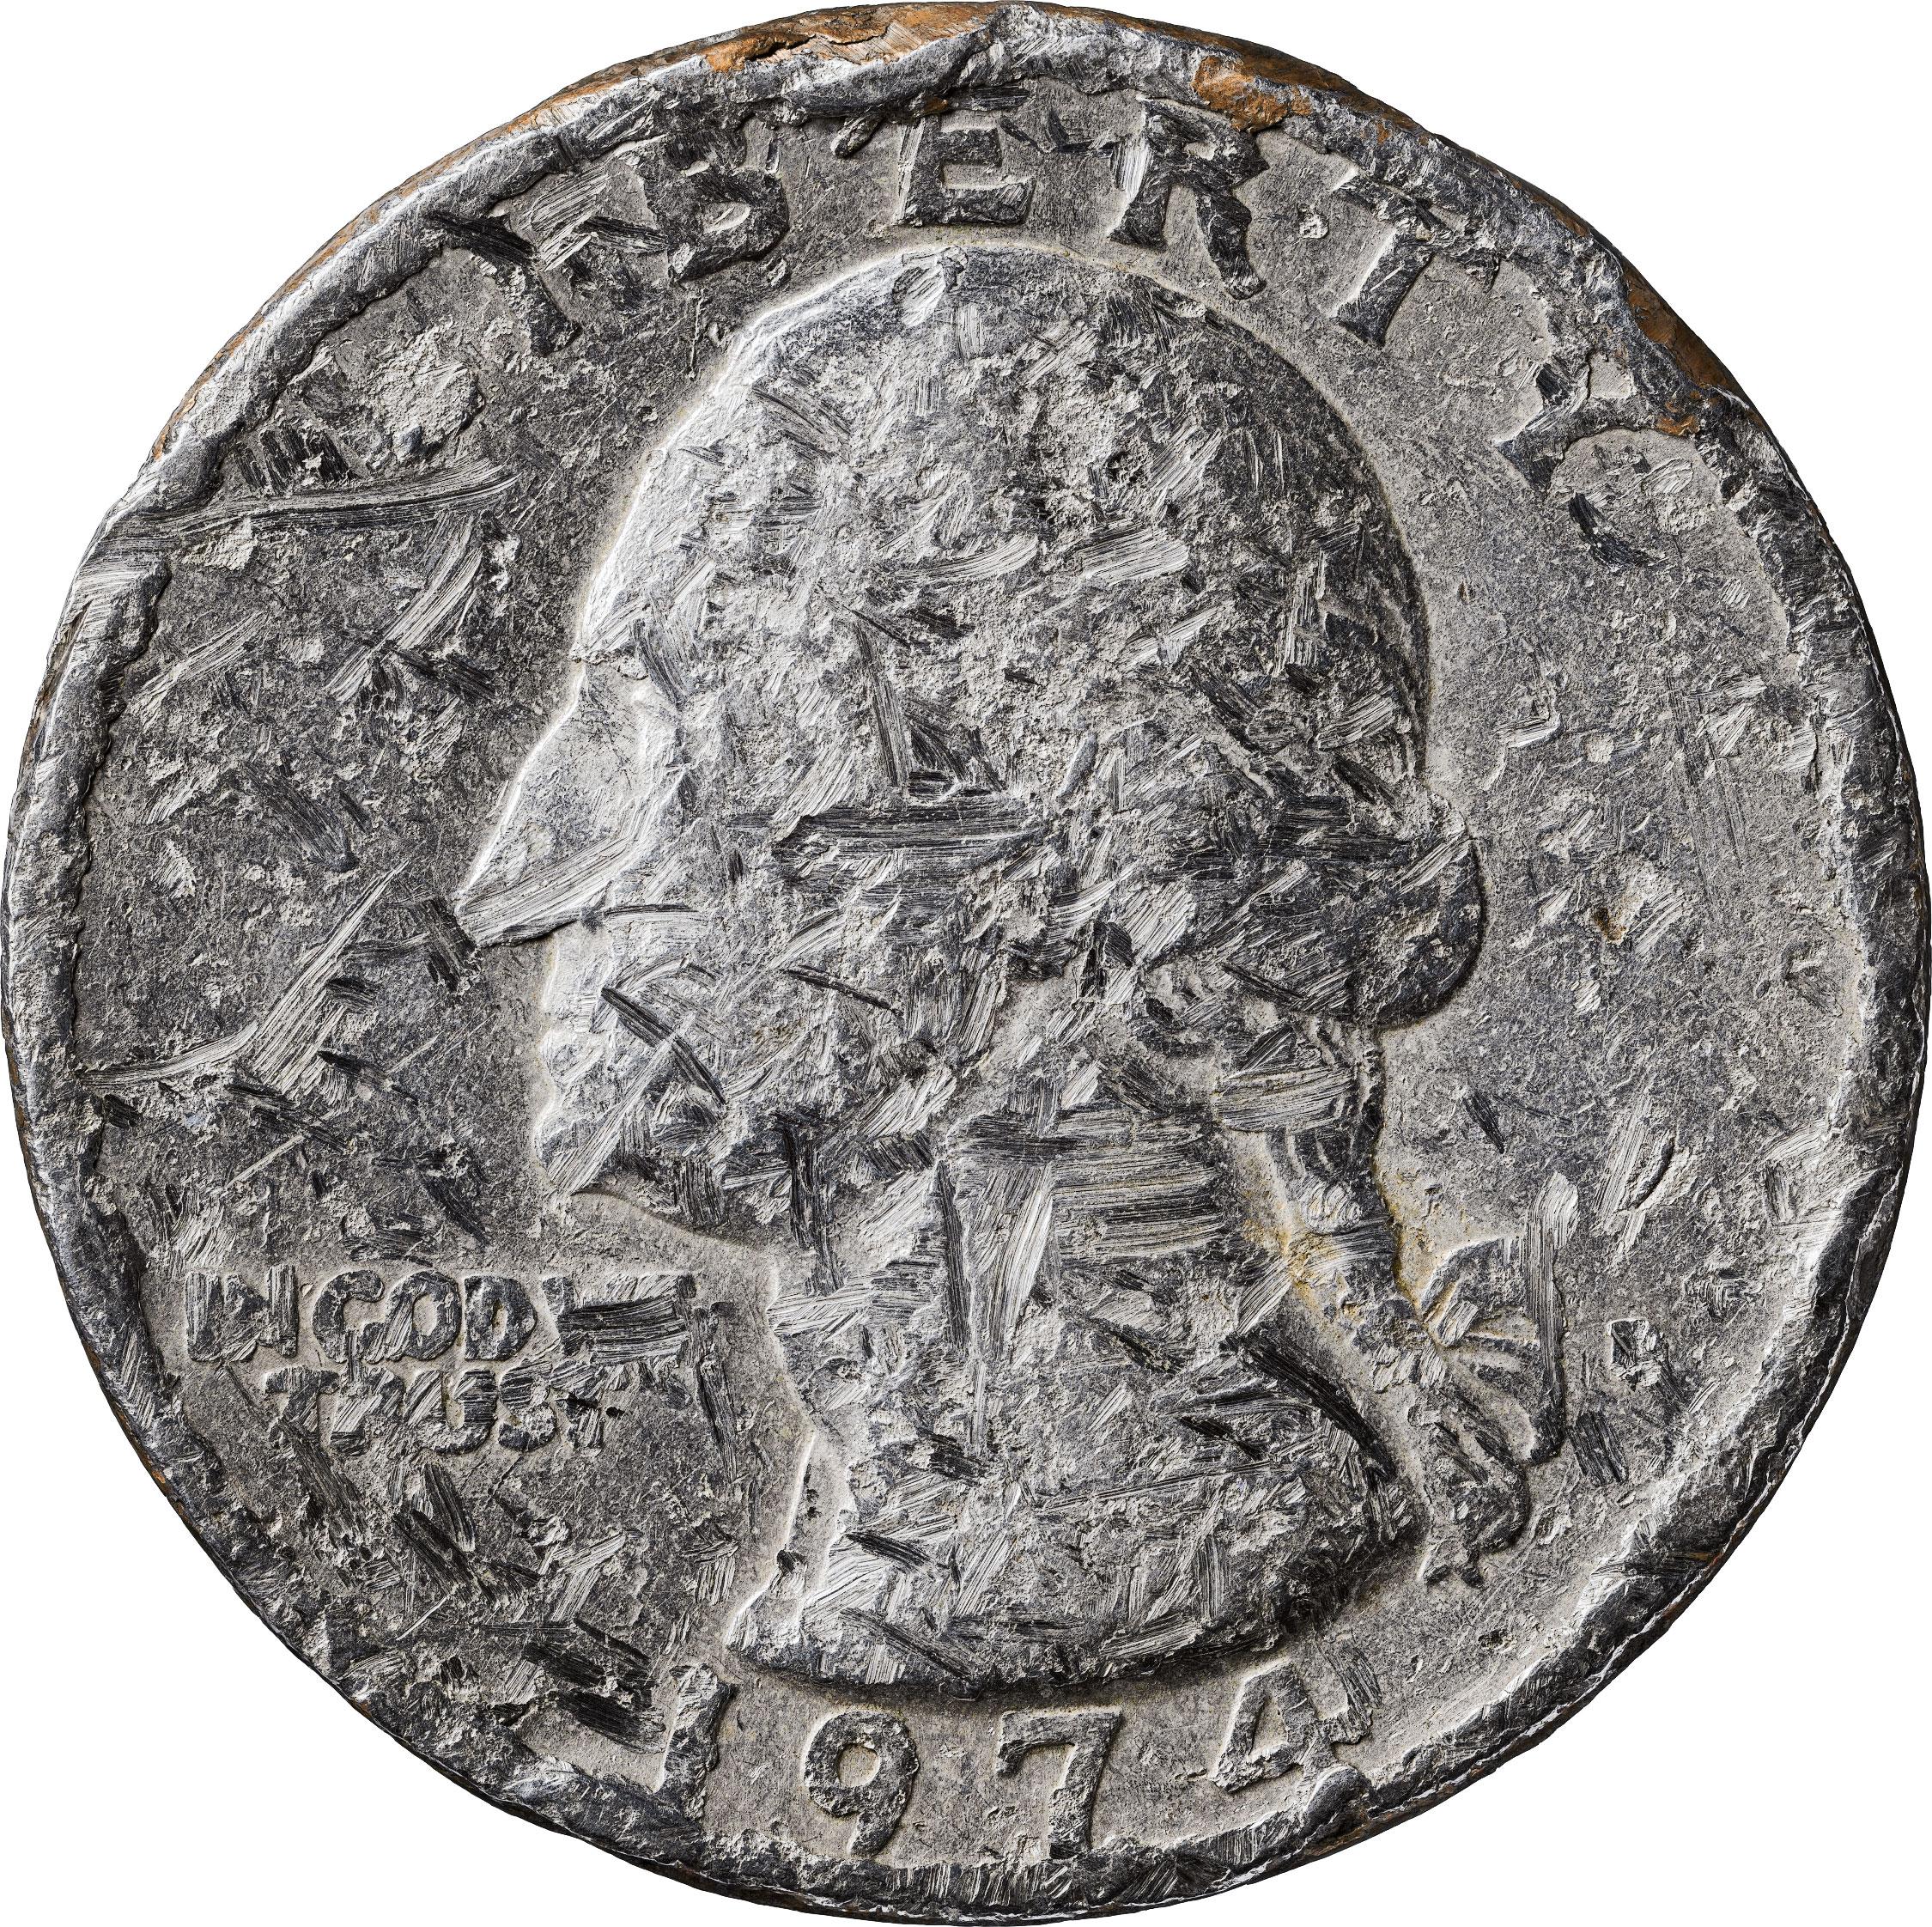 Coin-3_2250.jpg